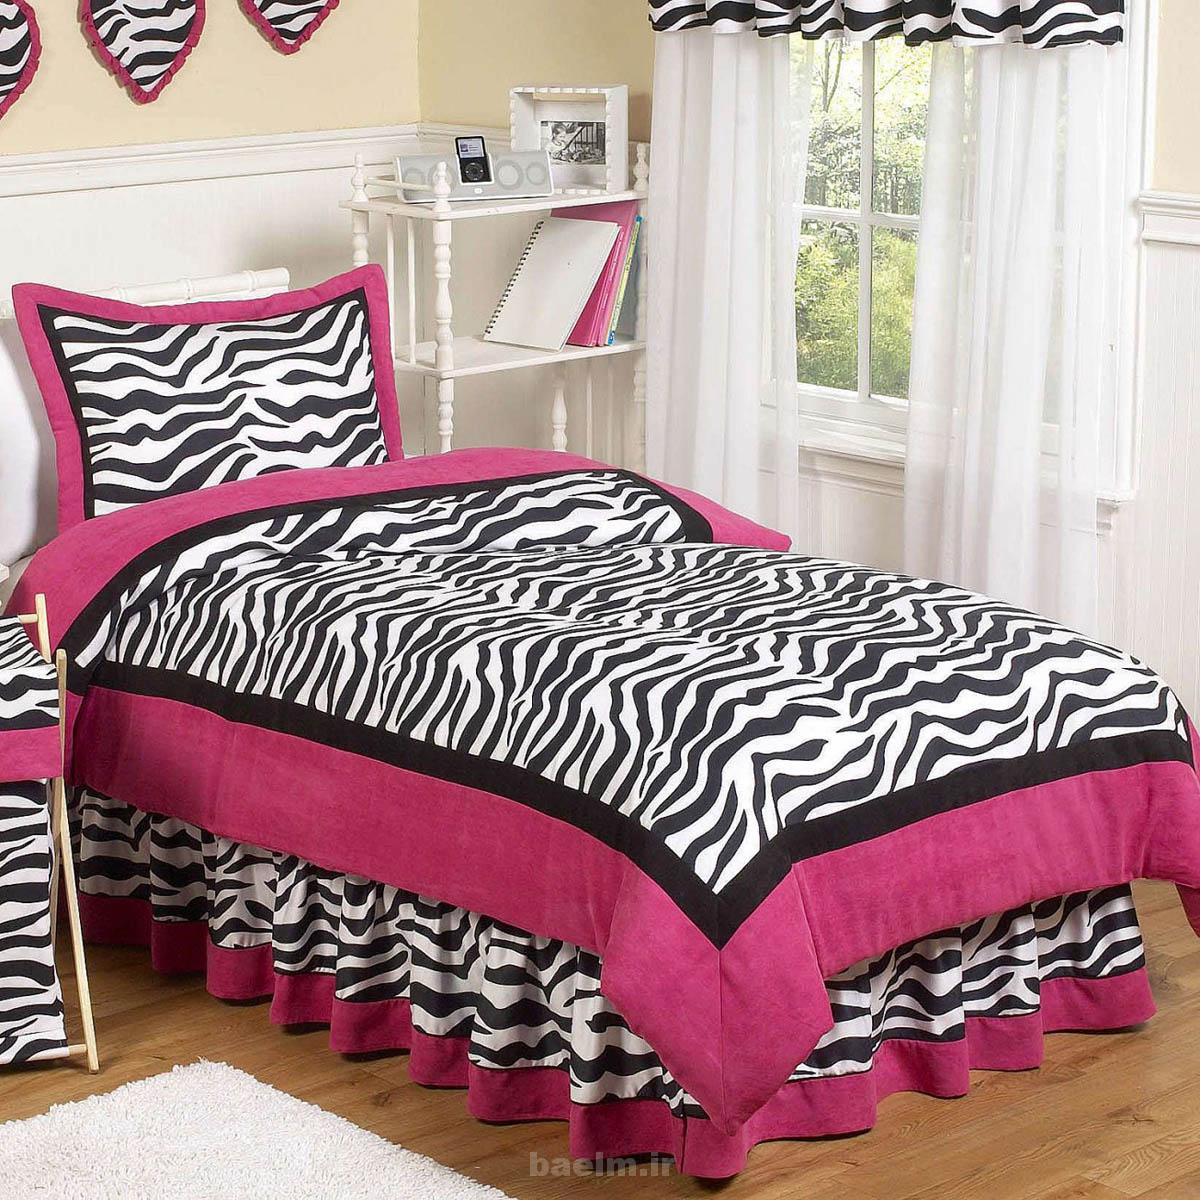 zebra print decor 1 Zebra Print Decor